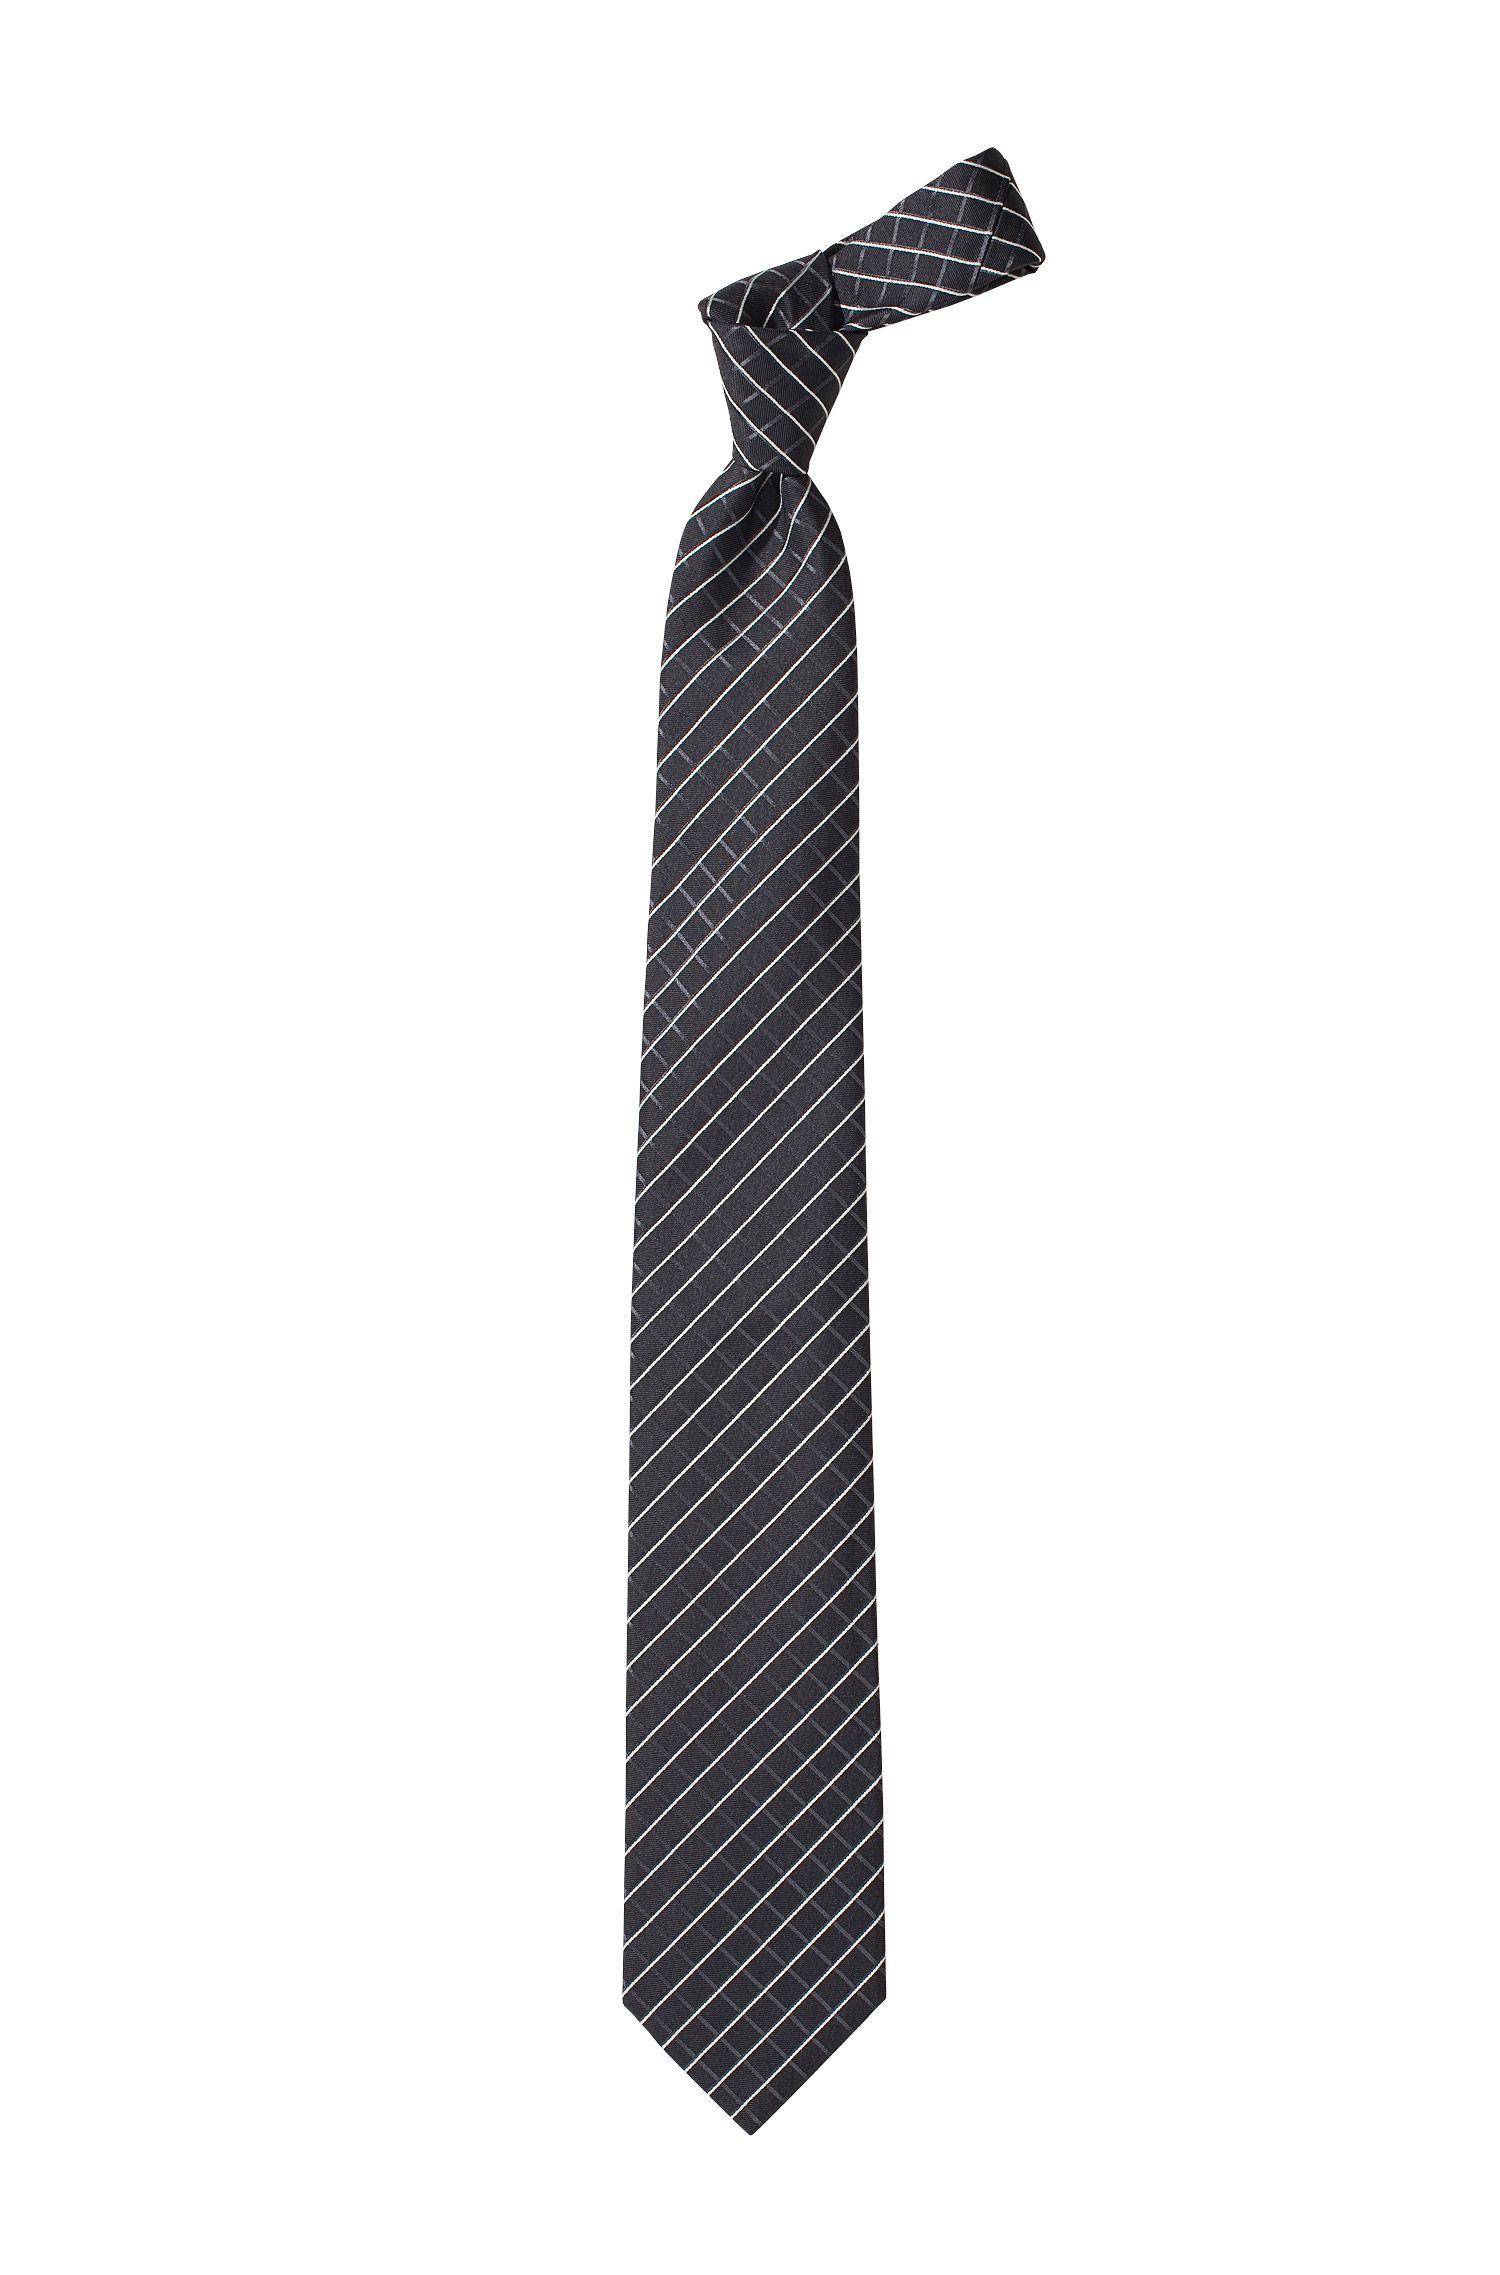 Fashion-Krawatte ´Tie cm 7,5` aus Seide